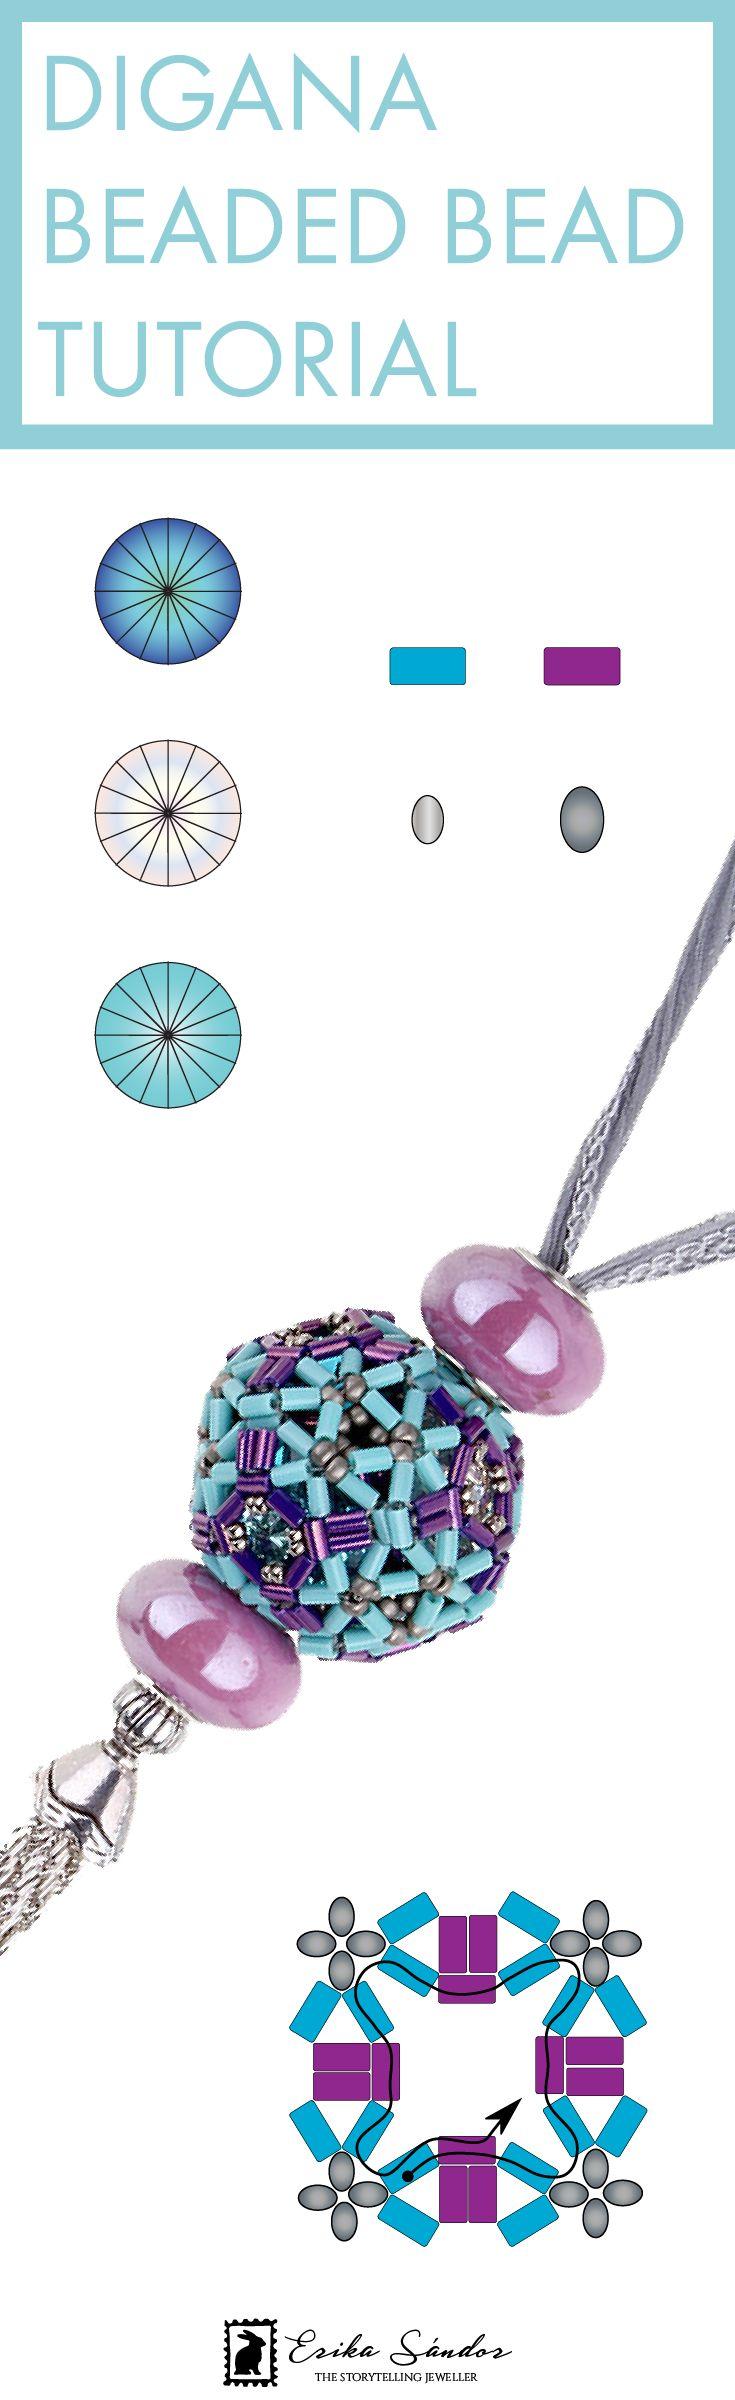 Beaded bead by Erika Sandor The Storytelling Jeweller. Beadsmith Inspiration Squad. Swarovski cabochon rivoli fancy stones, Miyuki bugle beads, Japanese seed beads. Beading pattern / tutorial / schema / instructions. DIY, creativity, hobby, handmade jewellery / jewelry, arts and crafts, blue and purple necklace pendant. Beadweaving / bead art. Art teacher.